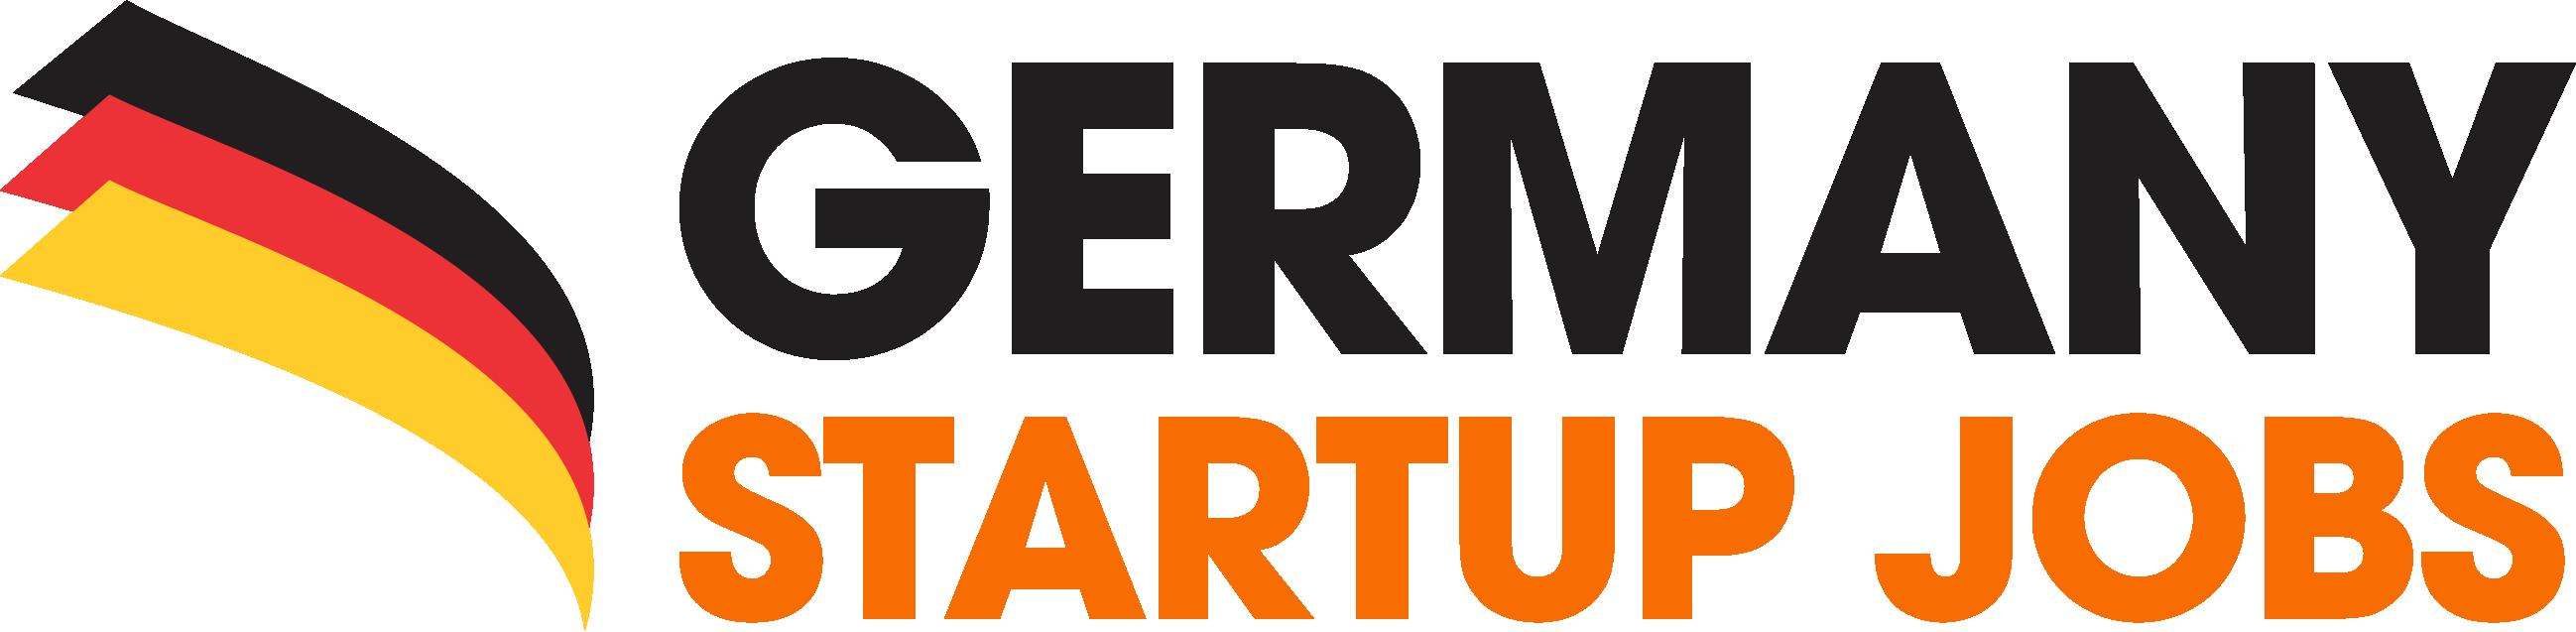 Startup Jobs   Find Jobs in Berlin, Germany, Deutschland